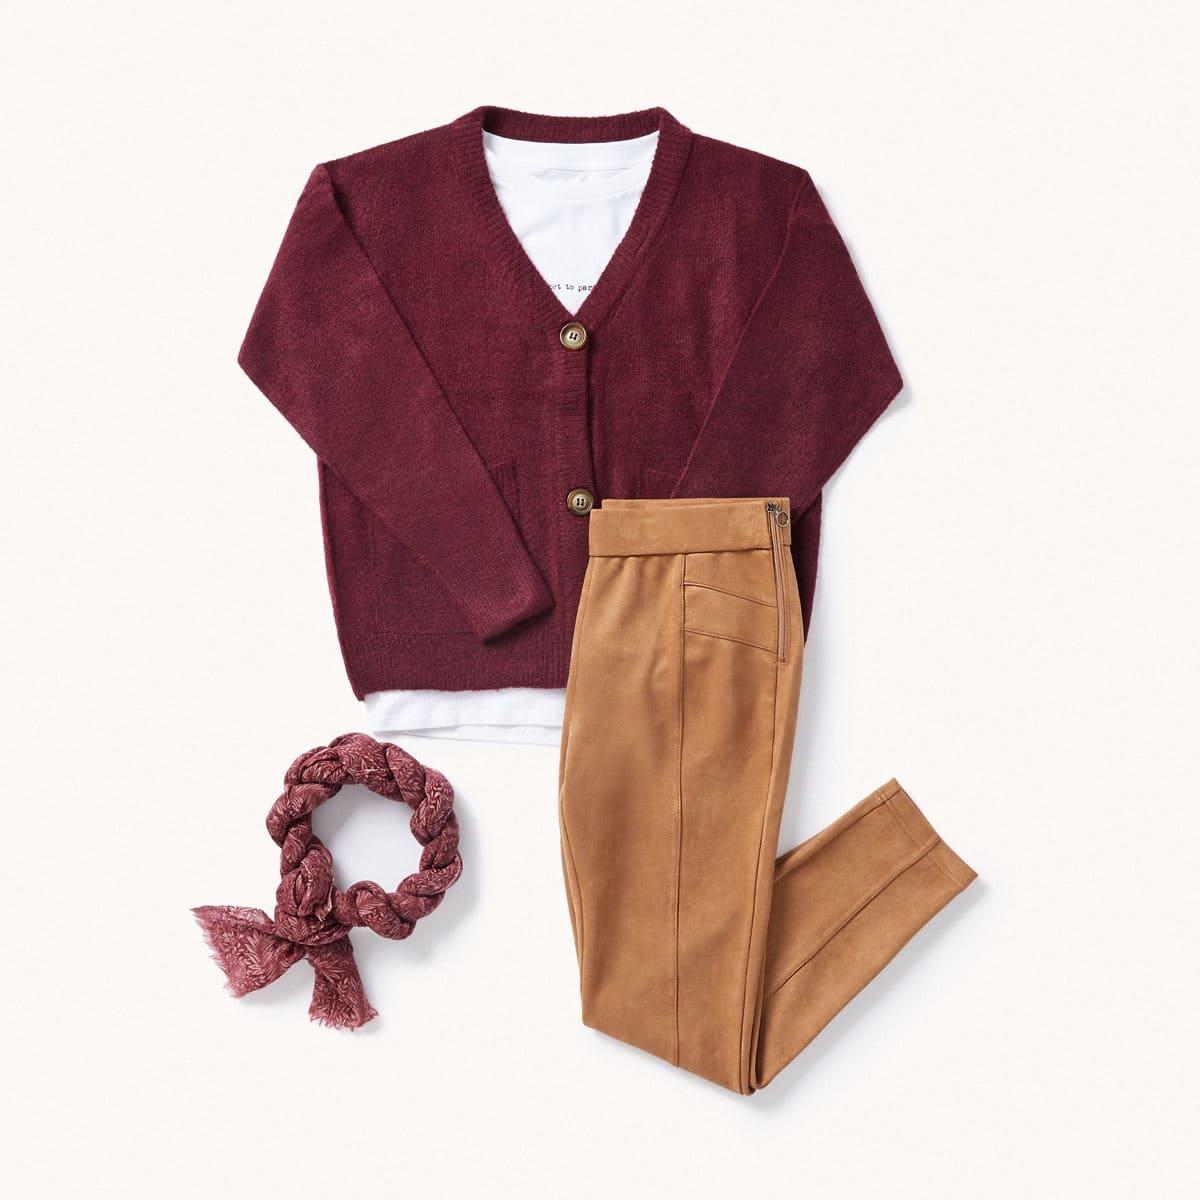 le tenue burgundy automne